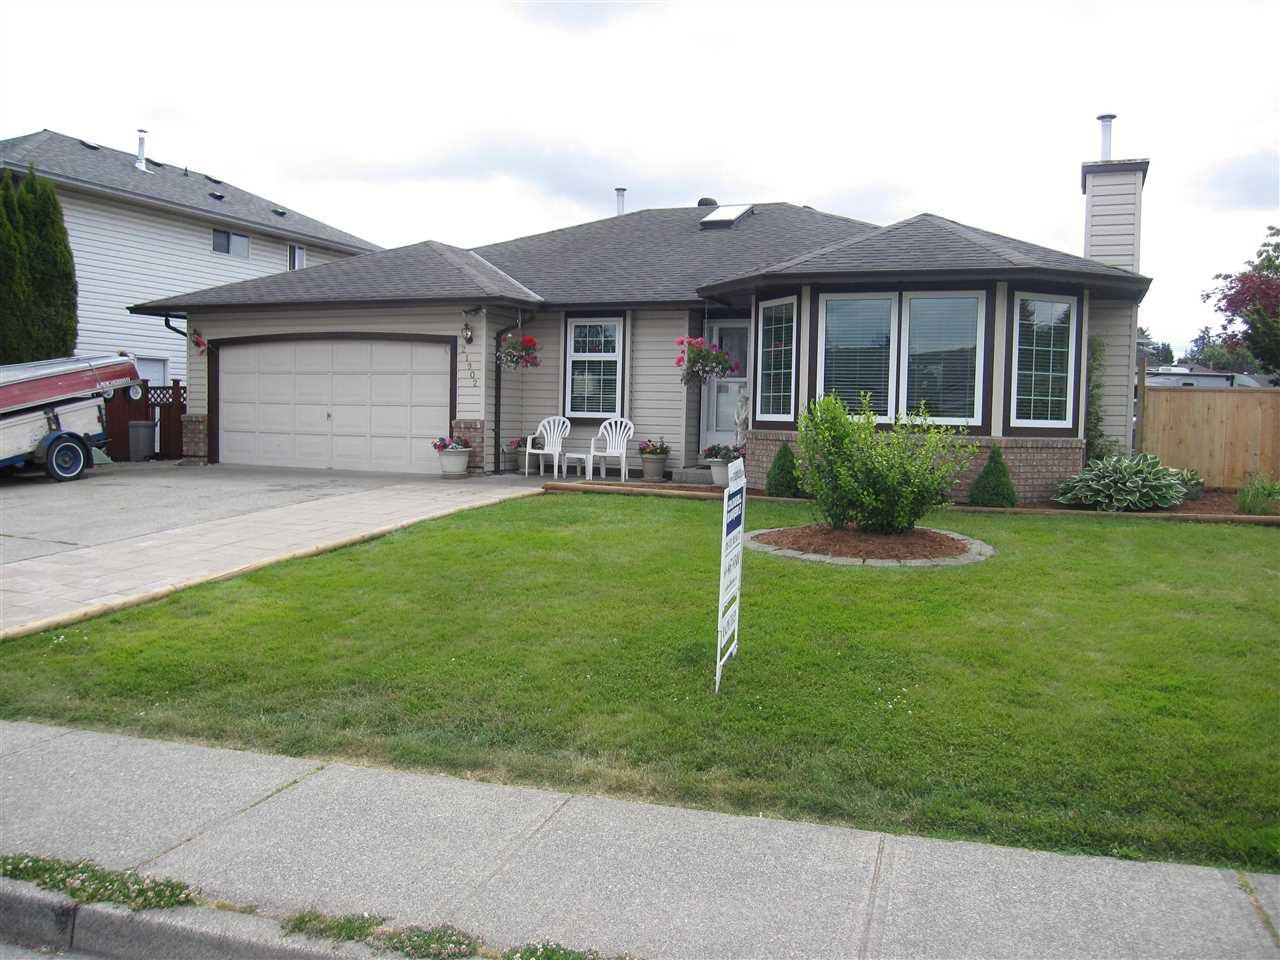 "Main Photo: 21902 126 Avenue in Maple Ridge: West Central House for sale in ""DAVISON SUBDIVISON"" : MLS®# R2279774"